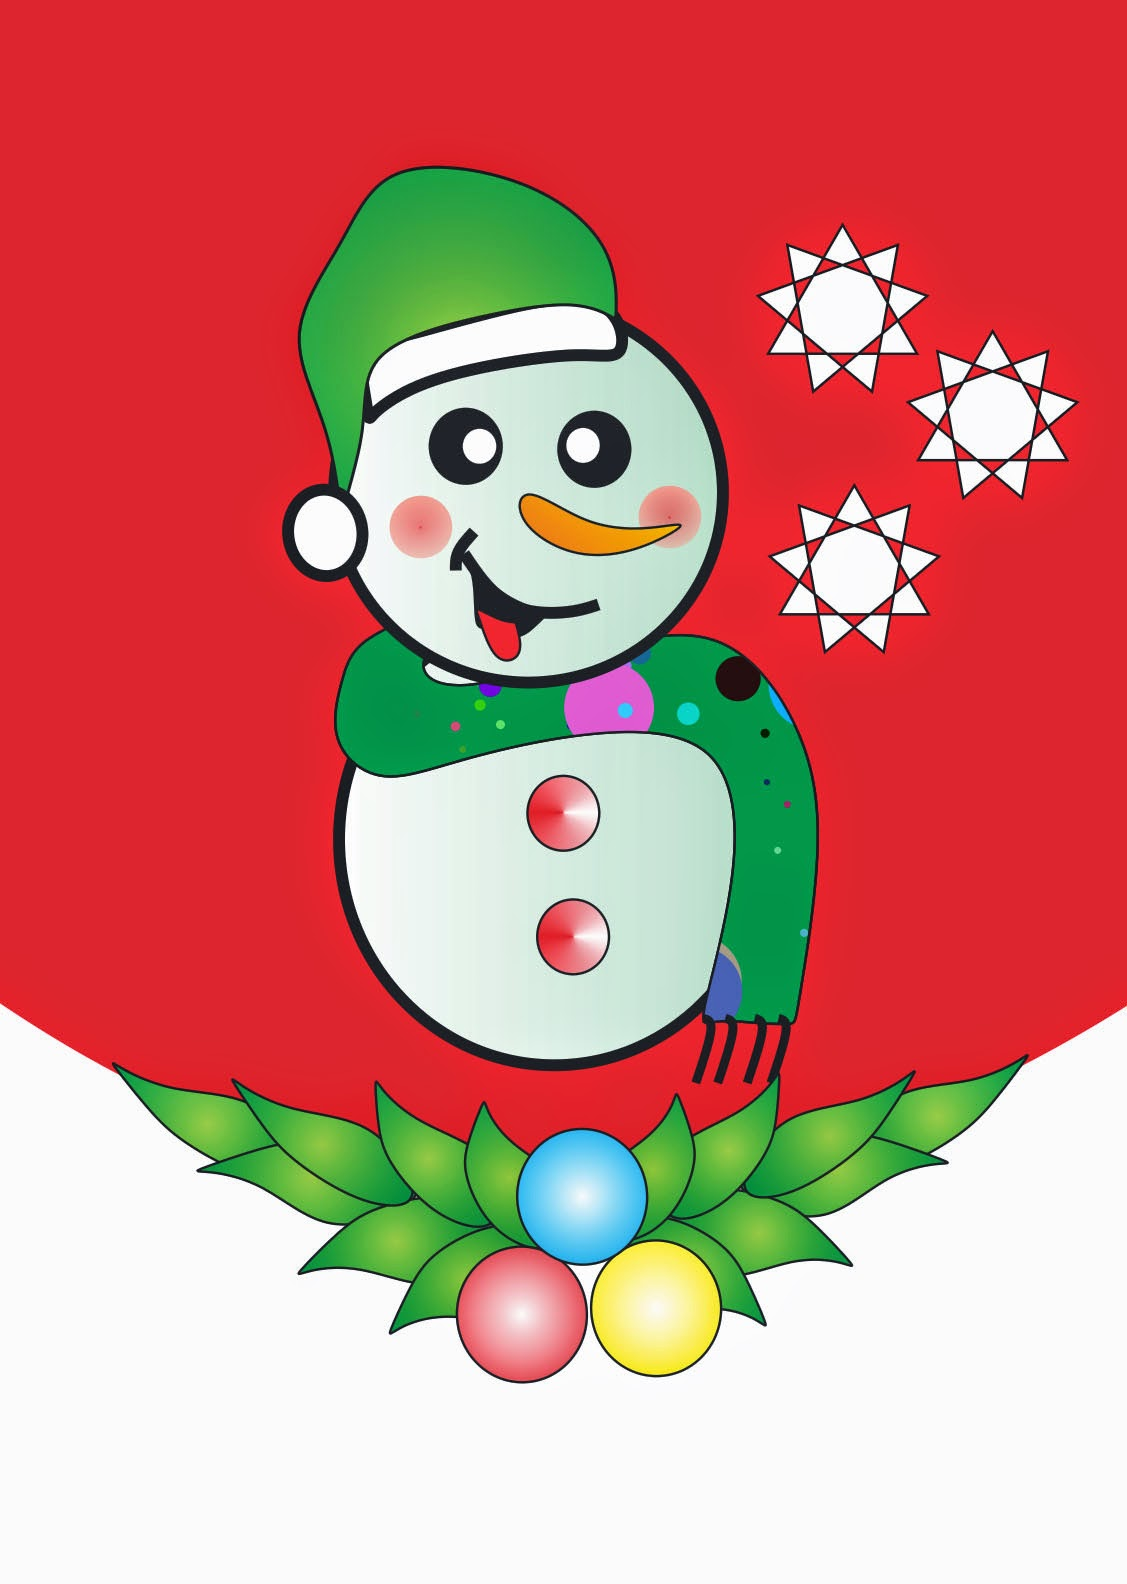 Armario Sin Puertas Niños ~ Imagens Especial de Natal para Adesivos de Unhas IMAGENS DE ADESIVOS DE UNHAS